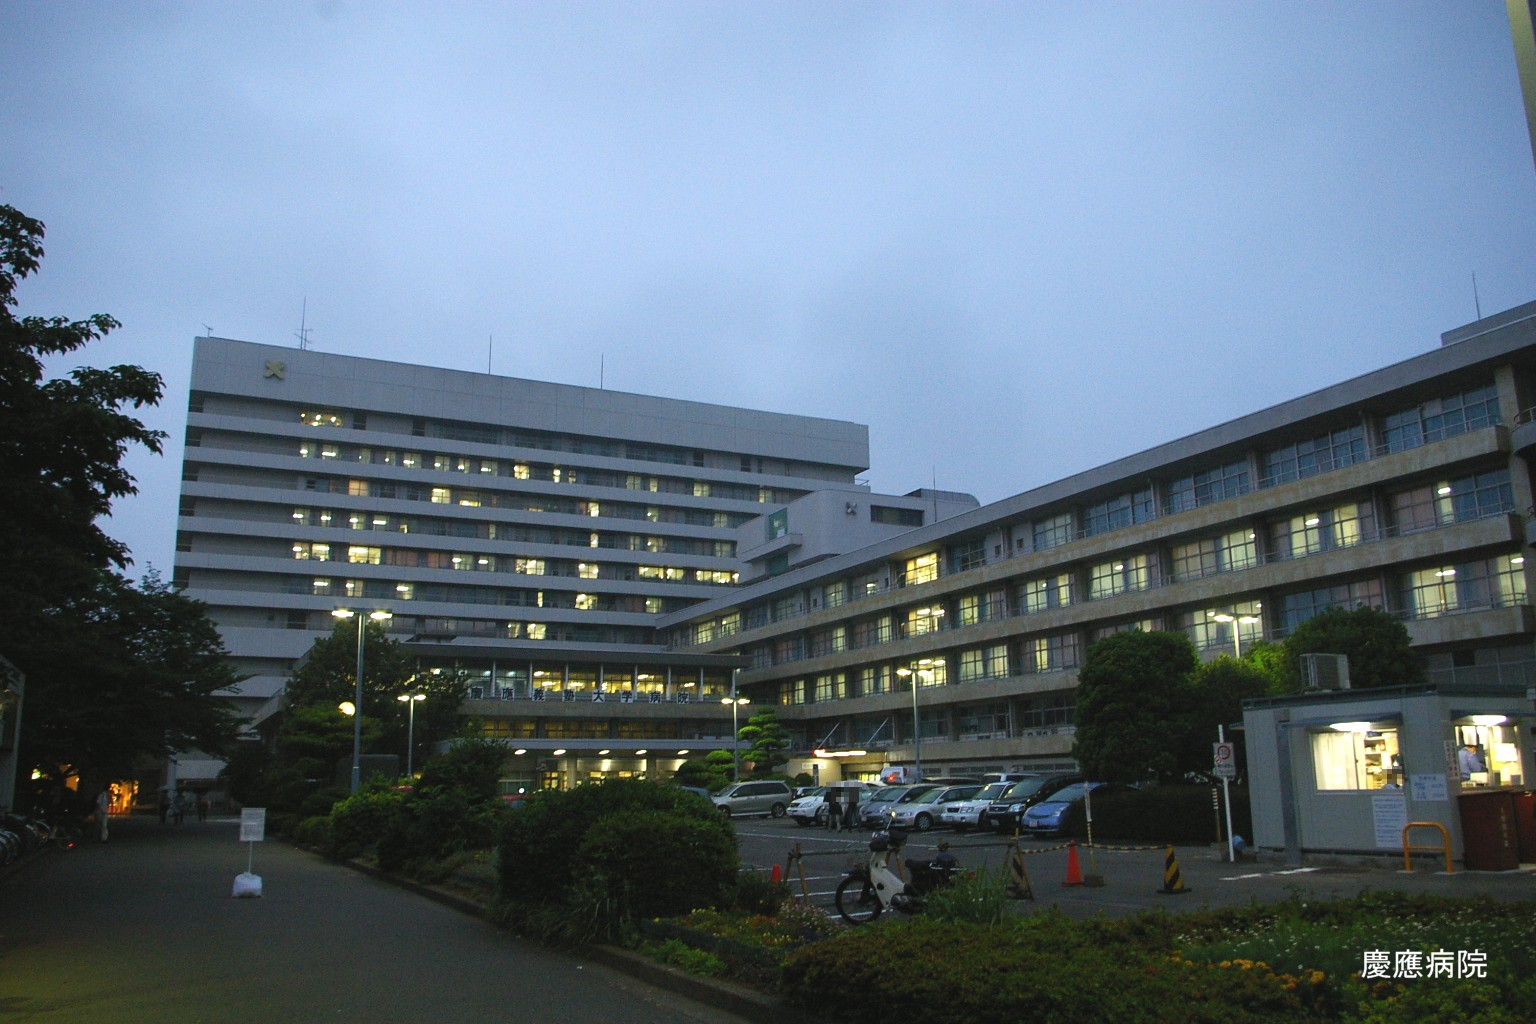 https://upload.wikimedia.org/wikipedia/commons/b/b3/Keio_University_Hospital.jpg